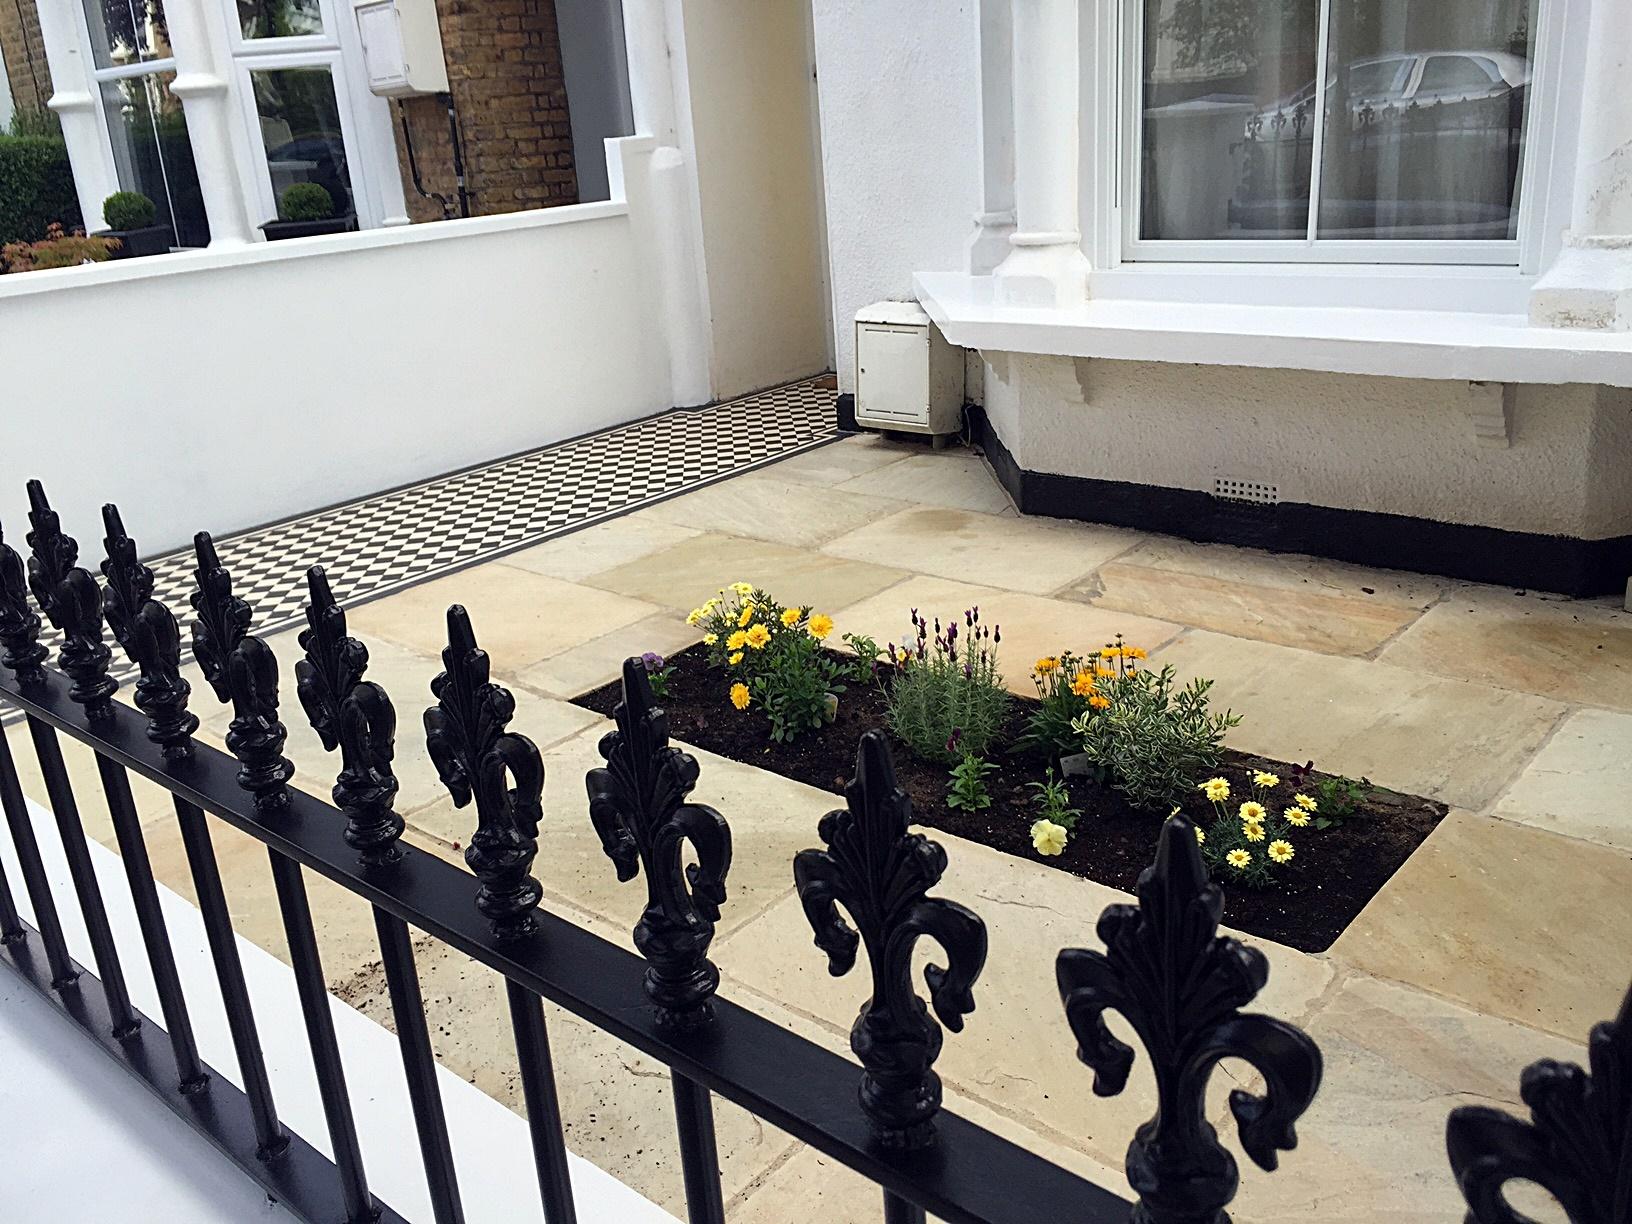 Metal gate rails white render walls path paving tiles London stone Balham Wandsworth Battersea Clapham